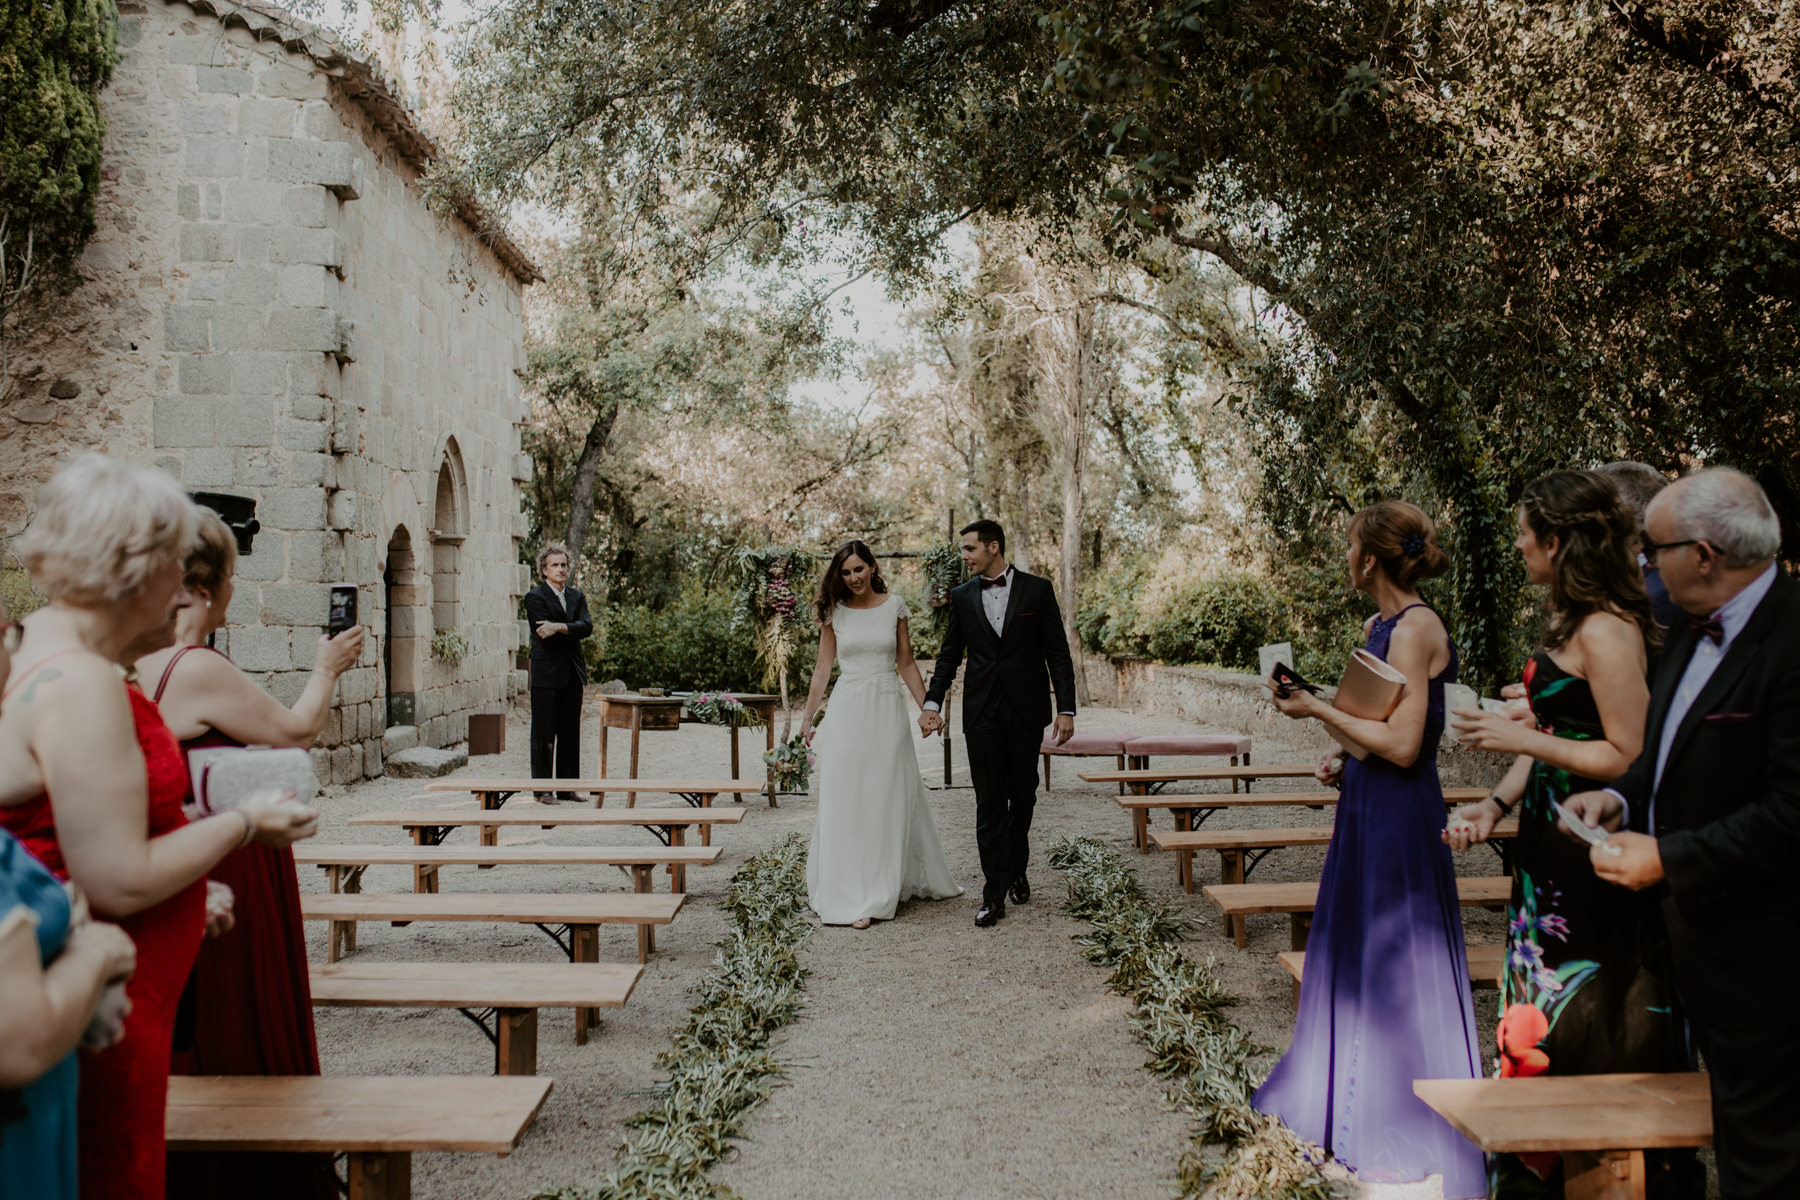 alt_thenortherngirlphotography_couples_weddingphotographer_photographer_wedding_boda_fotografodebodas_fotografobodasbarcelona_bodaindie_bodasconestilo_bodaensantperedeclara_jennifermiguel-398.jpg